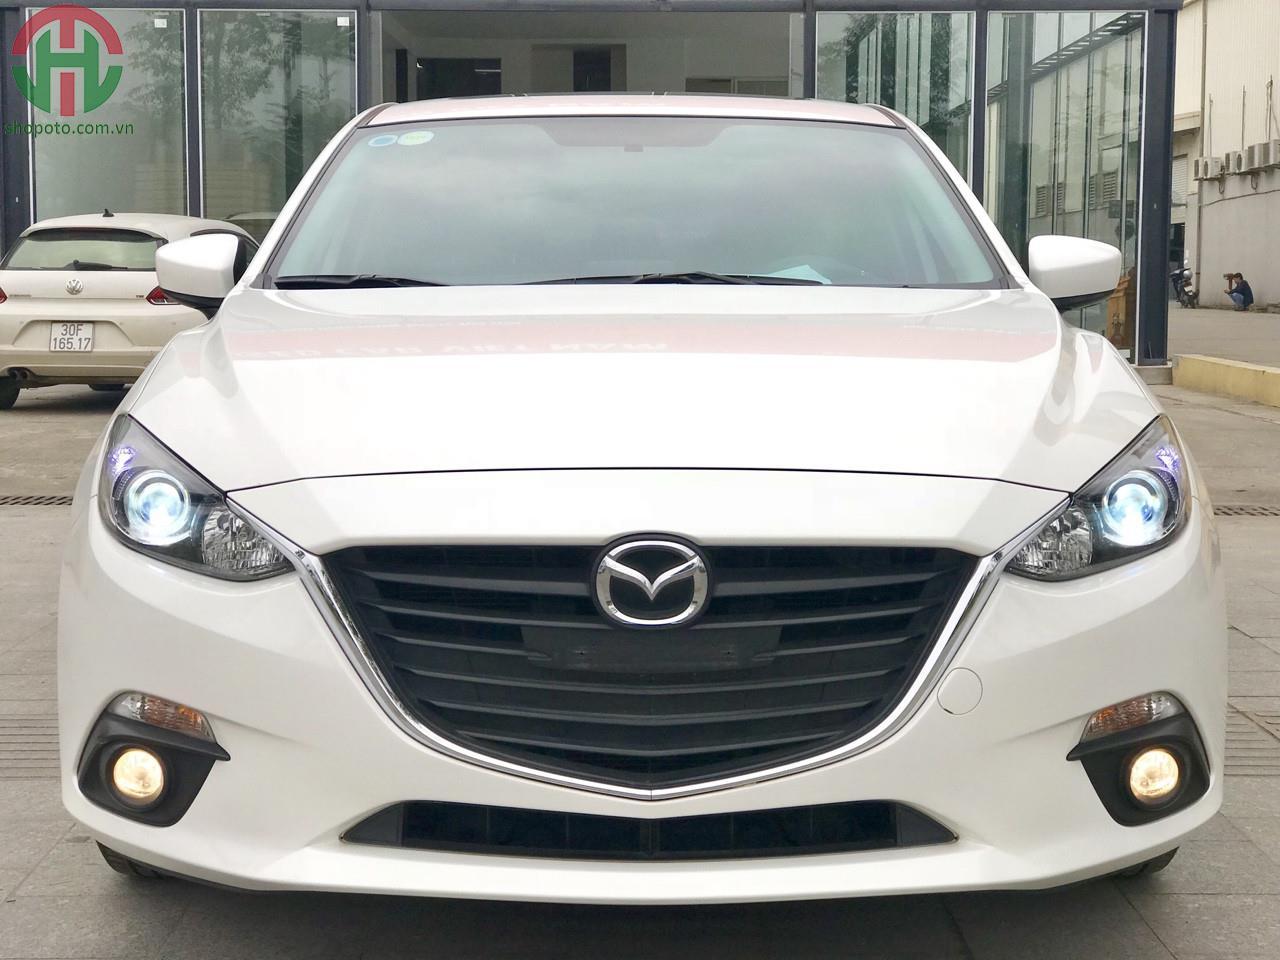 Mazda 3 1.5 AT Sedan 2016 màu Trắng